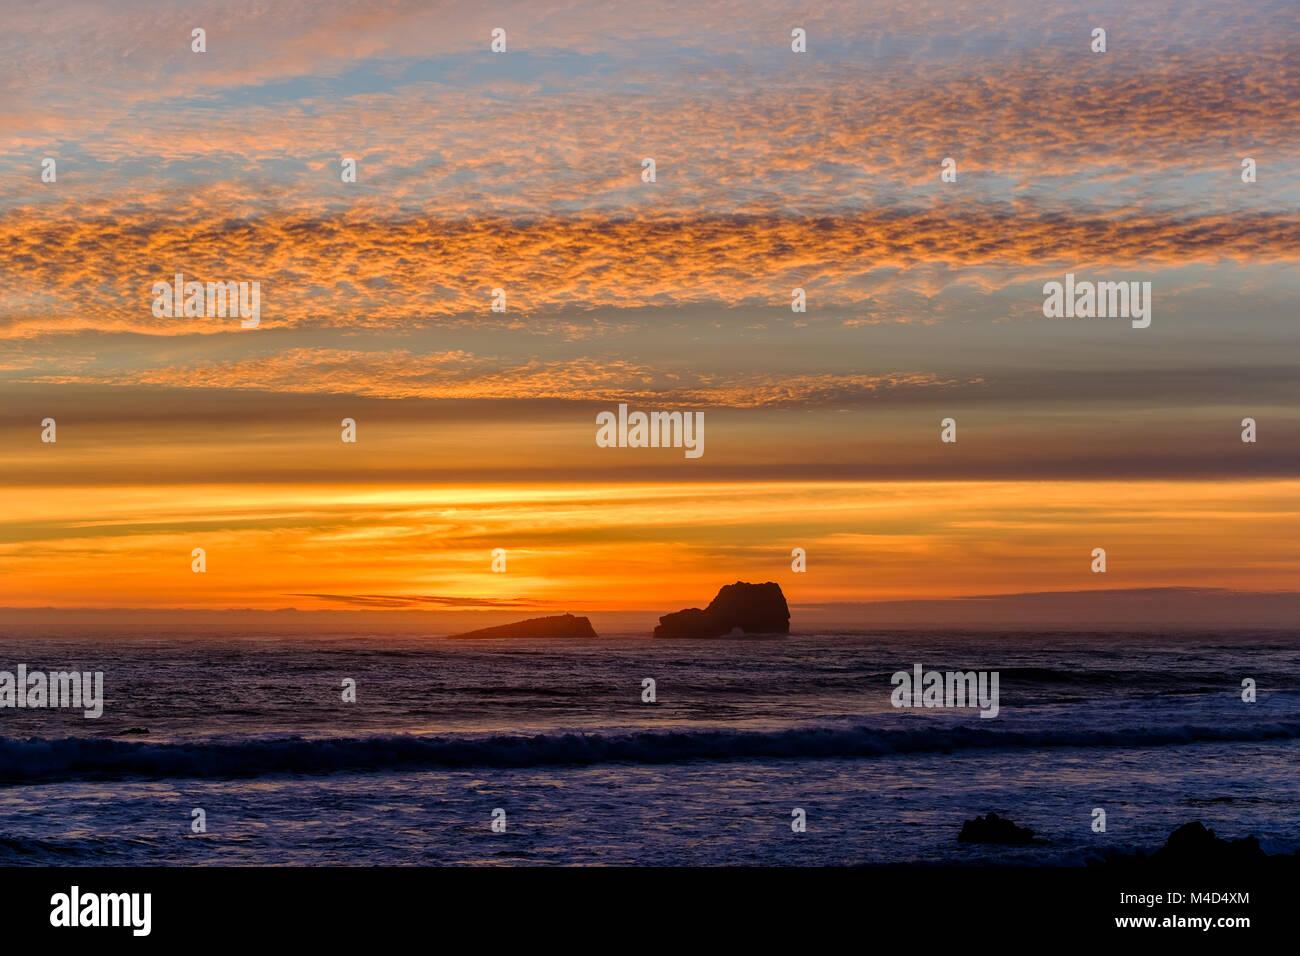 Pacific coast sunset, Big Sur, California, USA. - Stock Image